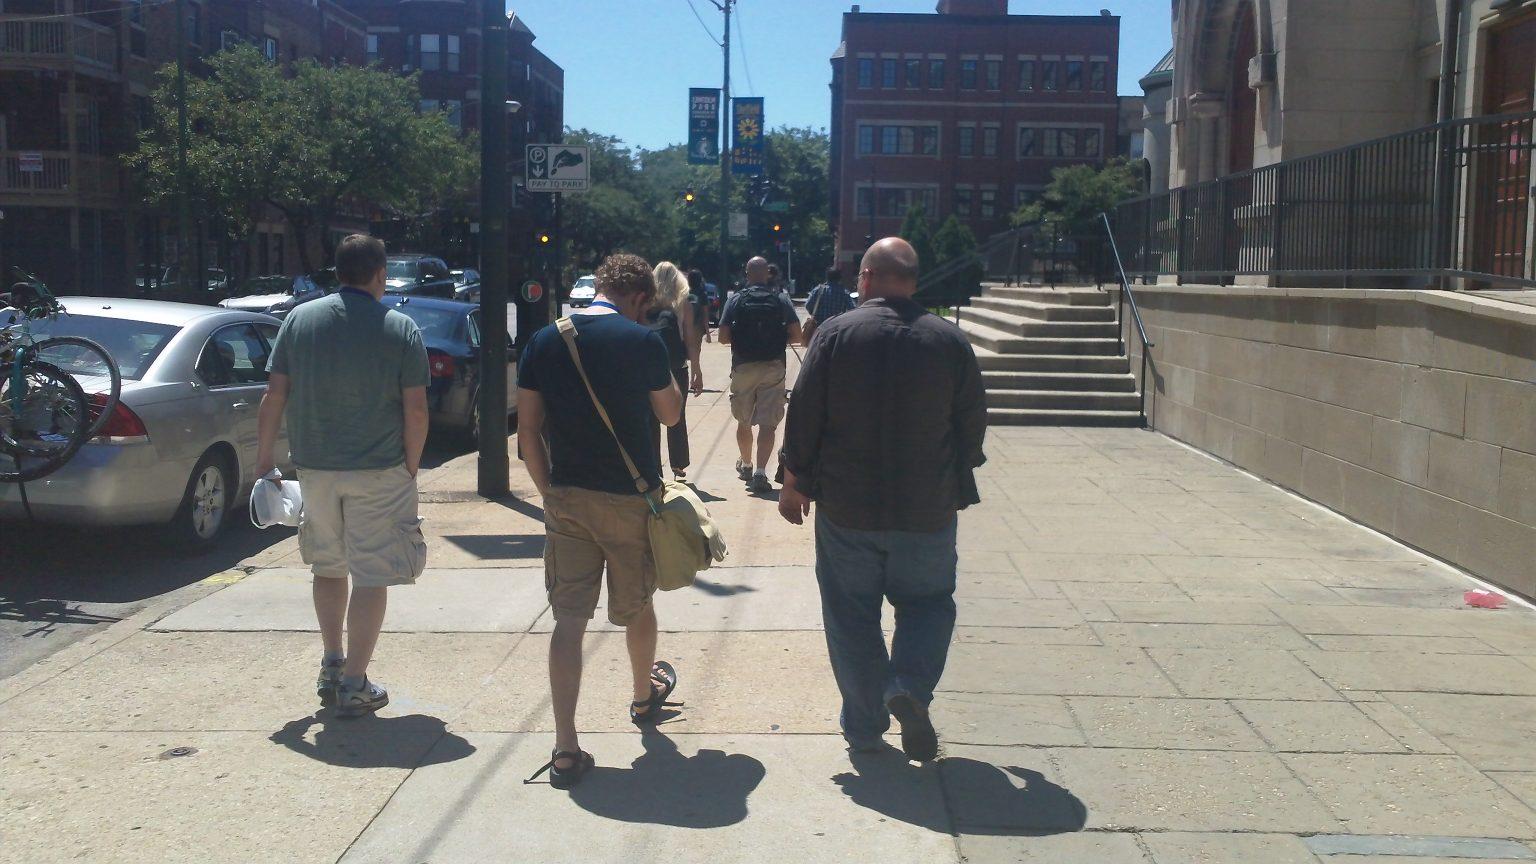 Three people walking away, down the road